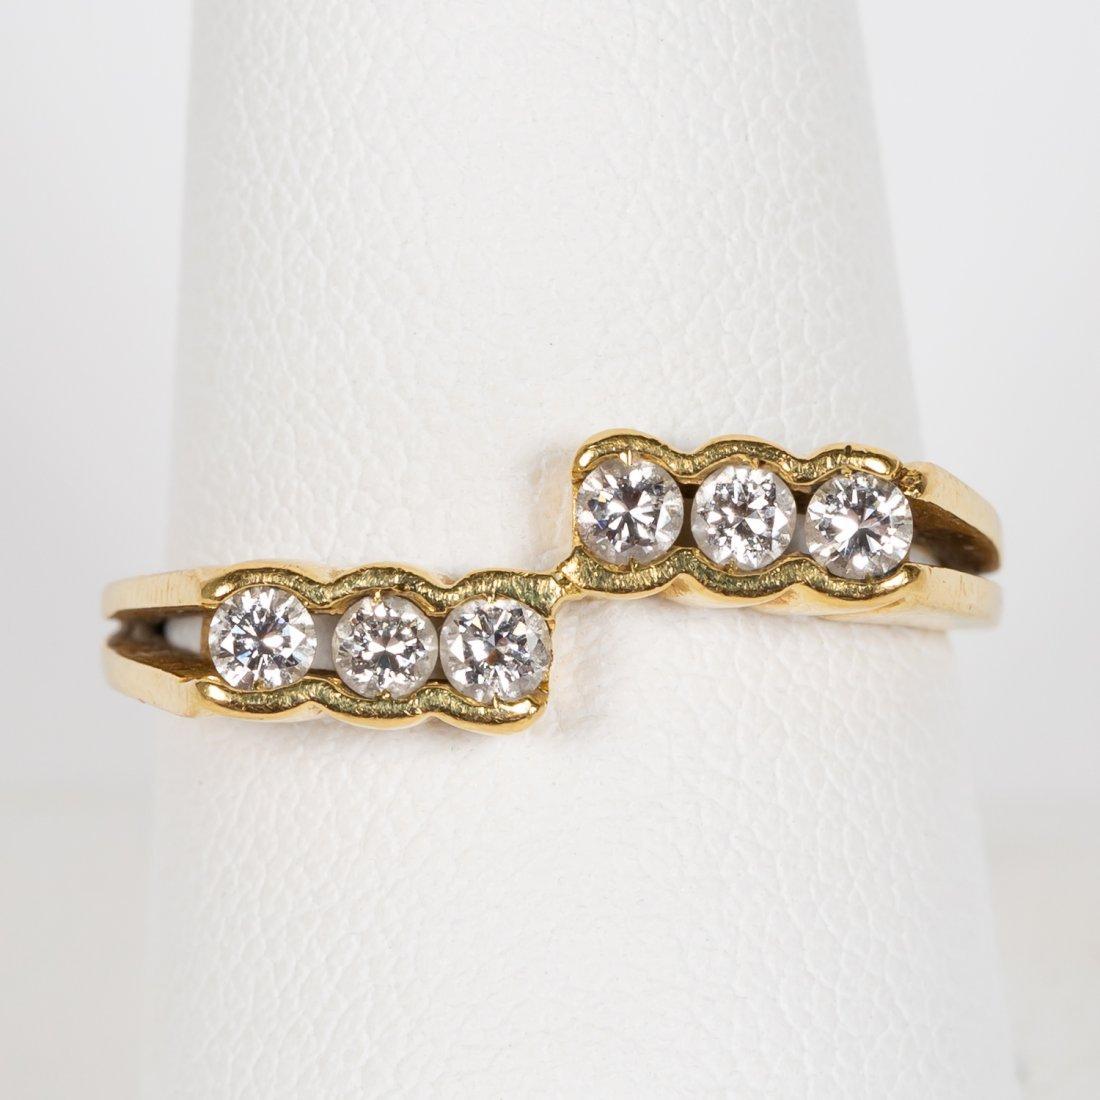 18k Yellow Gold & Six Diamond Ring